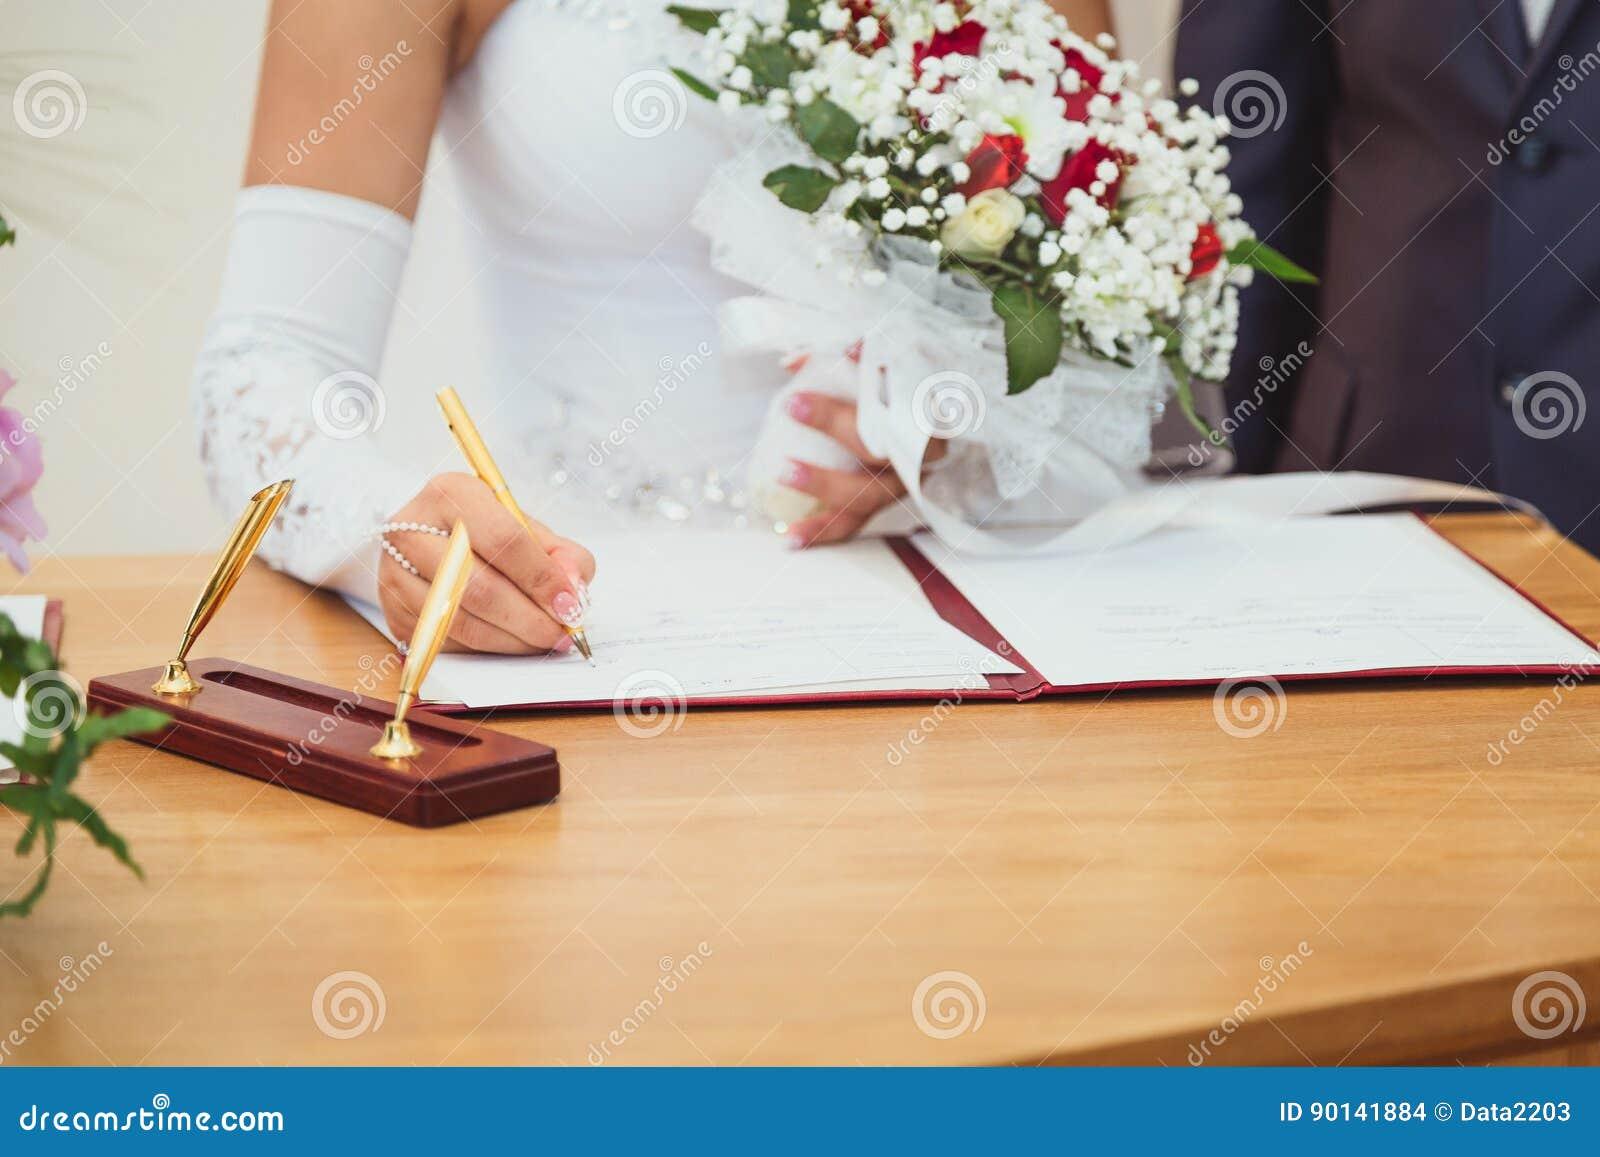 signing wedding marriage register stock photo image of bridal